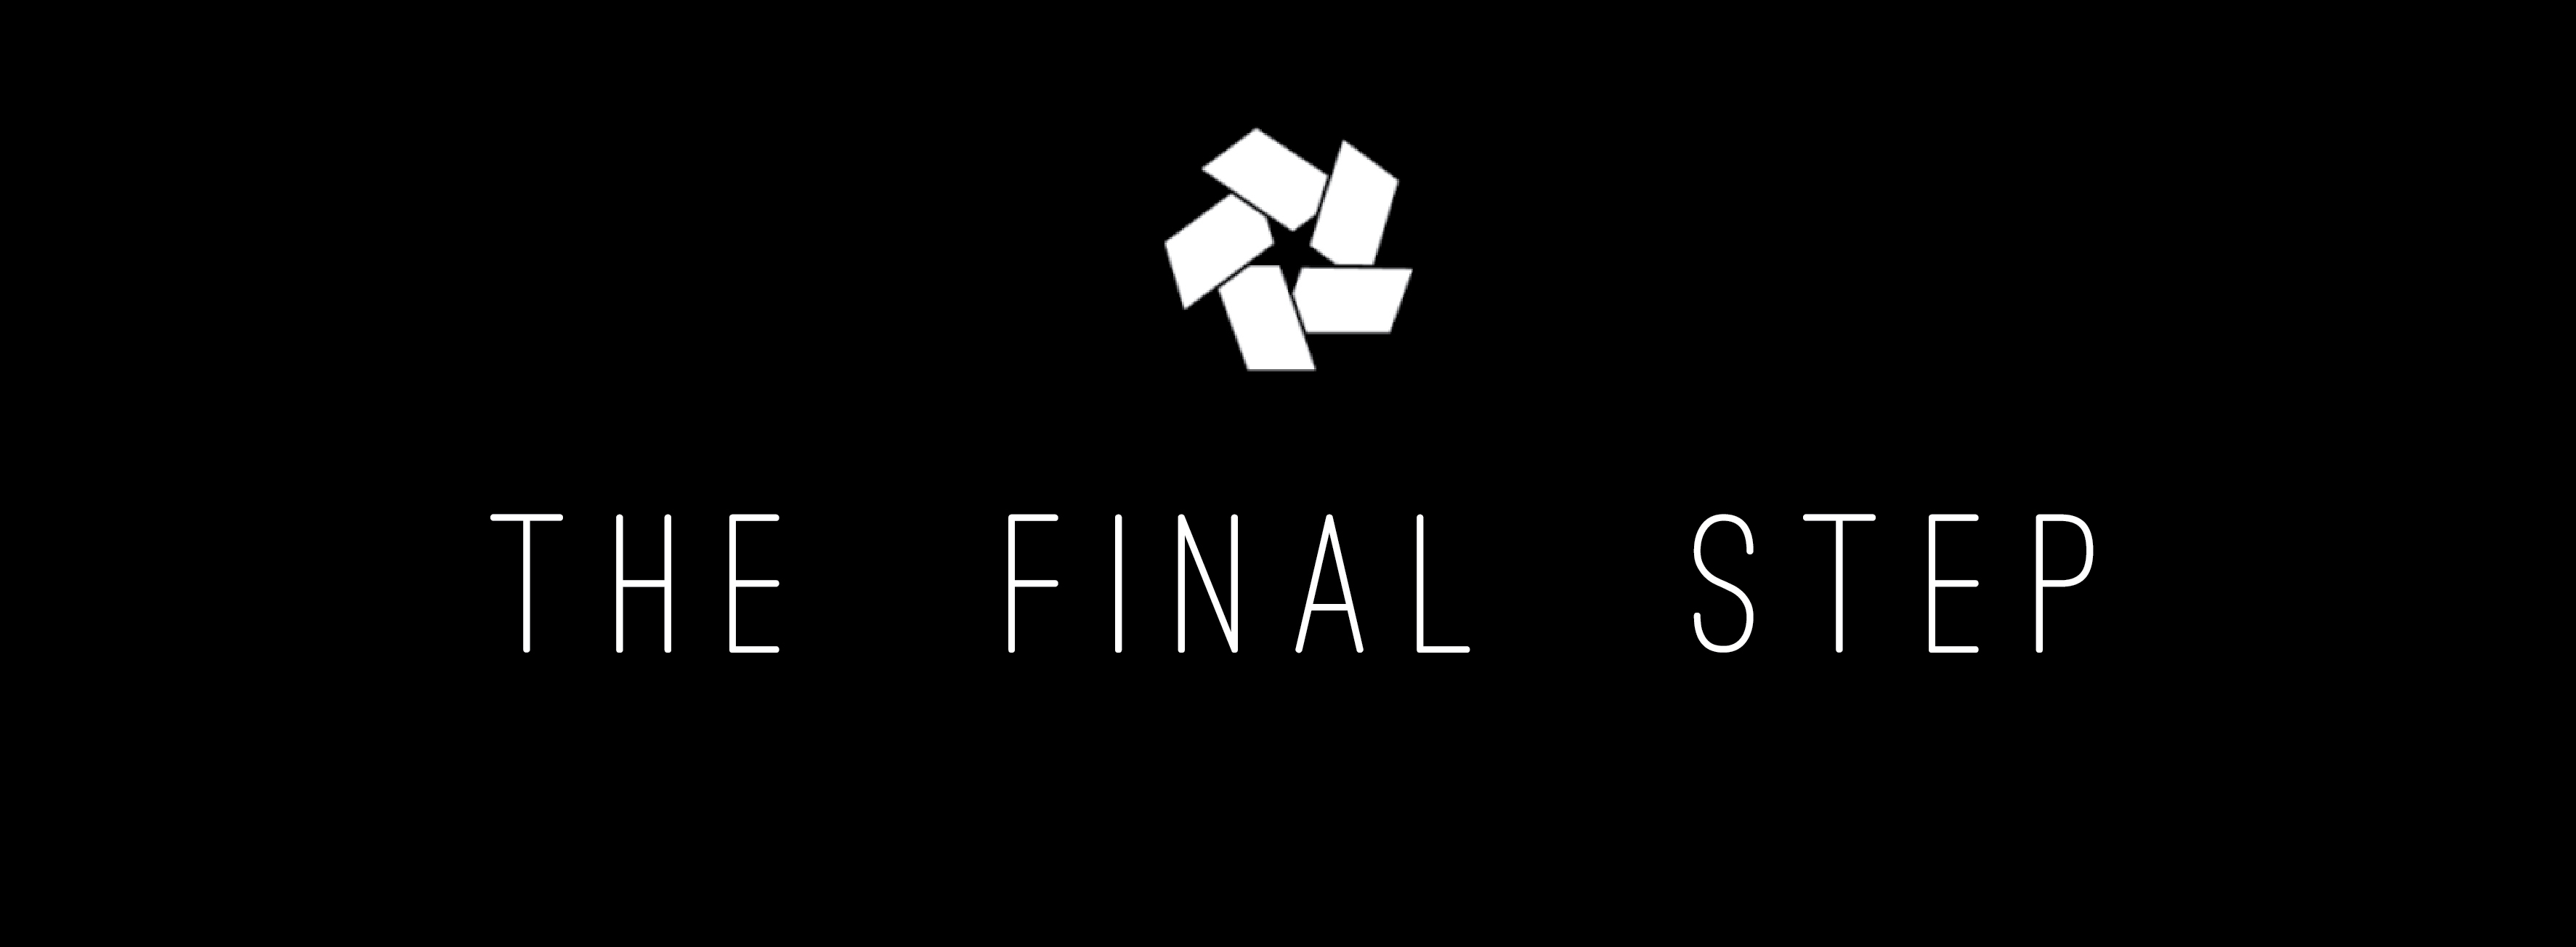 The_final_step-soundbetter-01